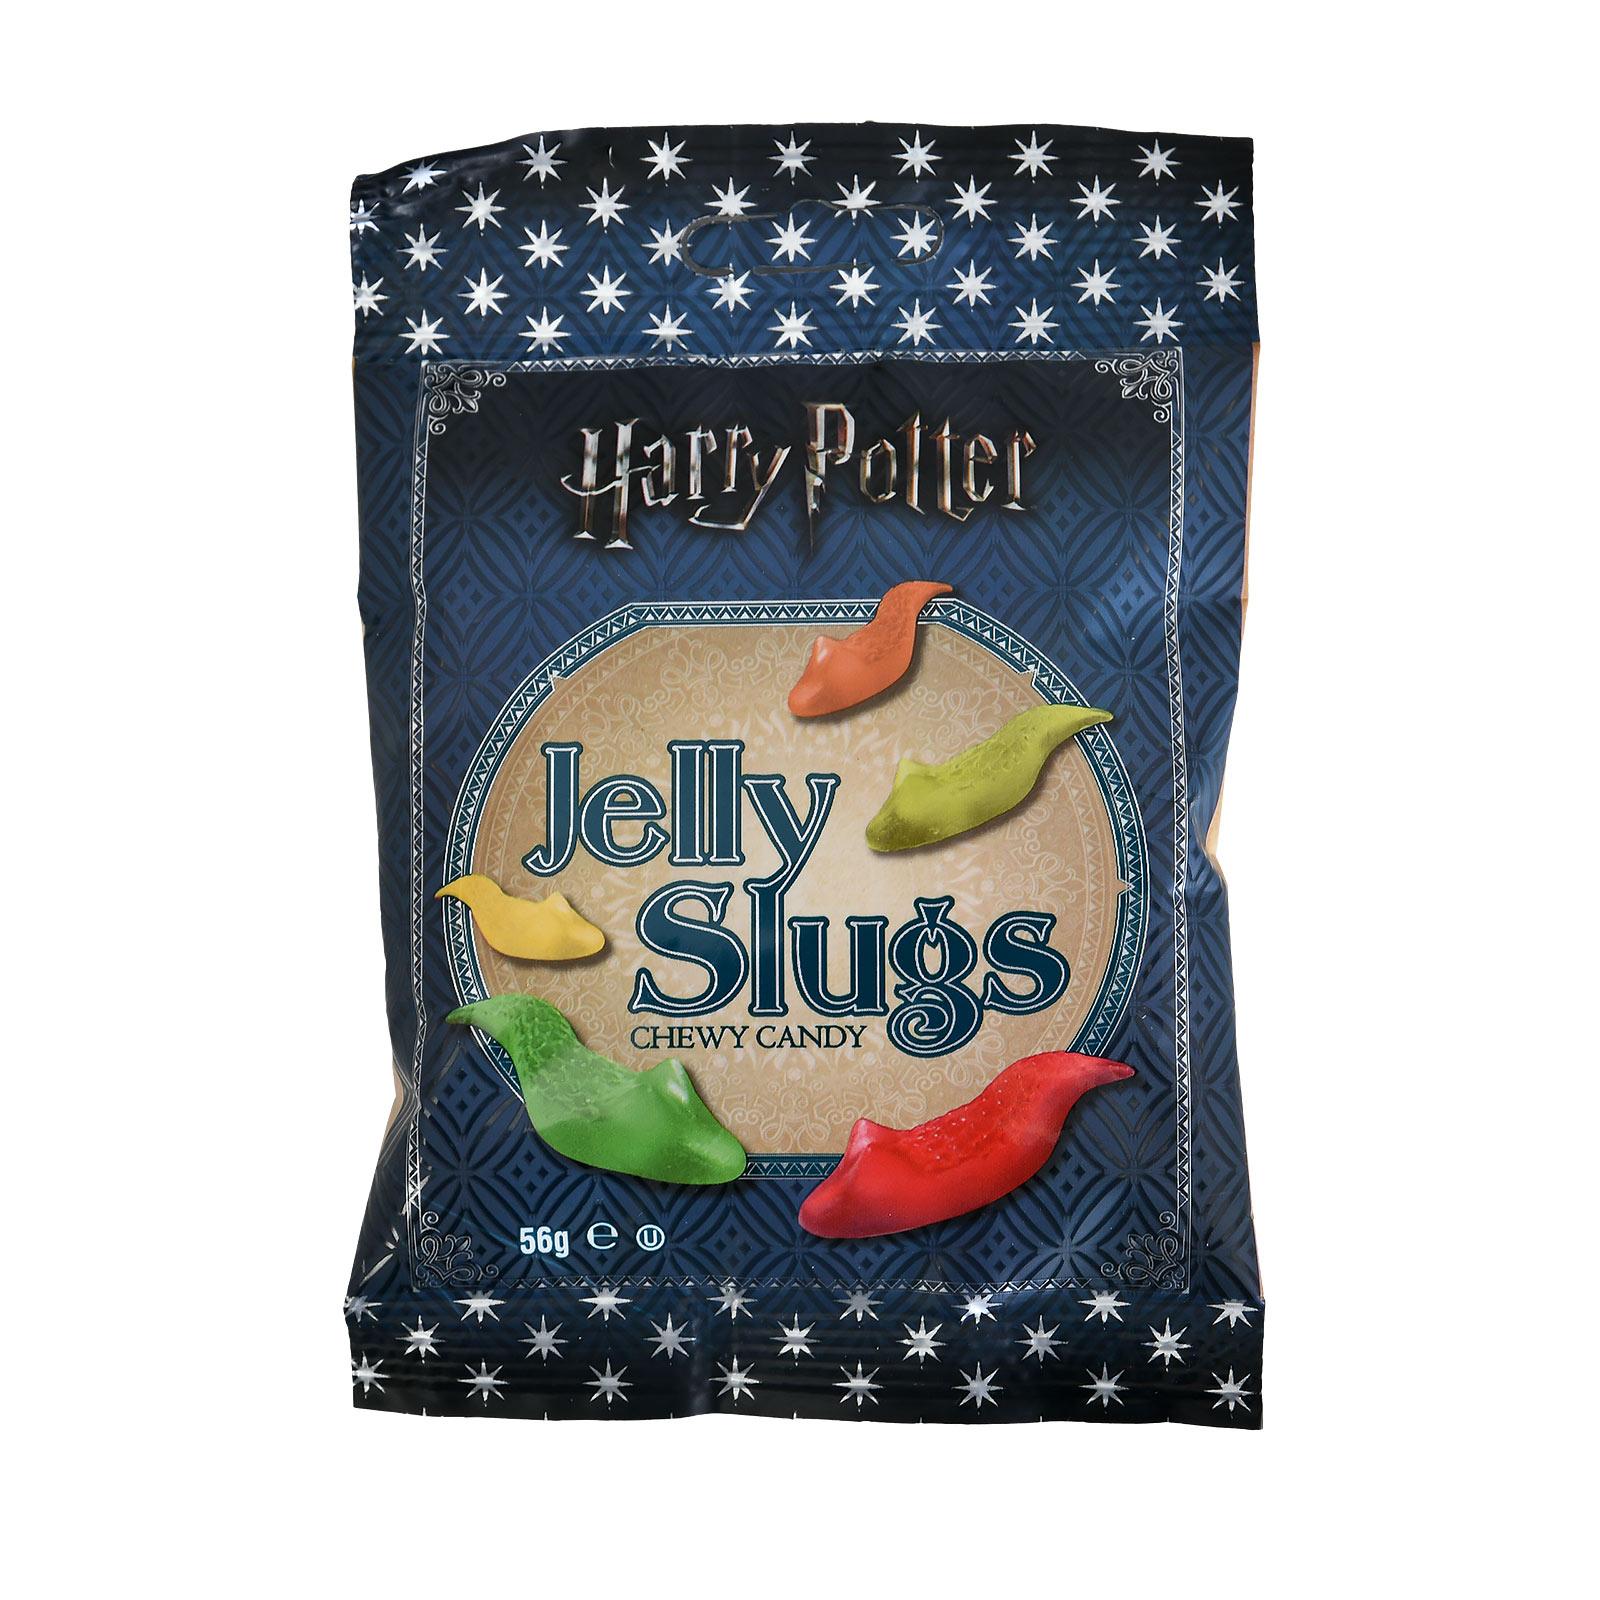 Harry Potter - Jelly Slugs